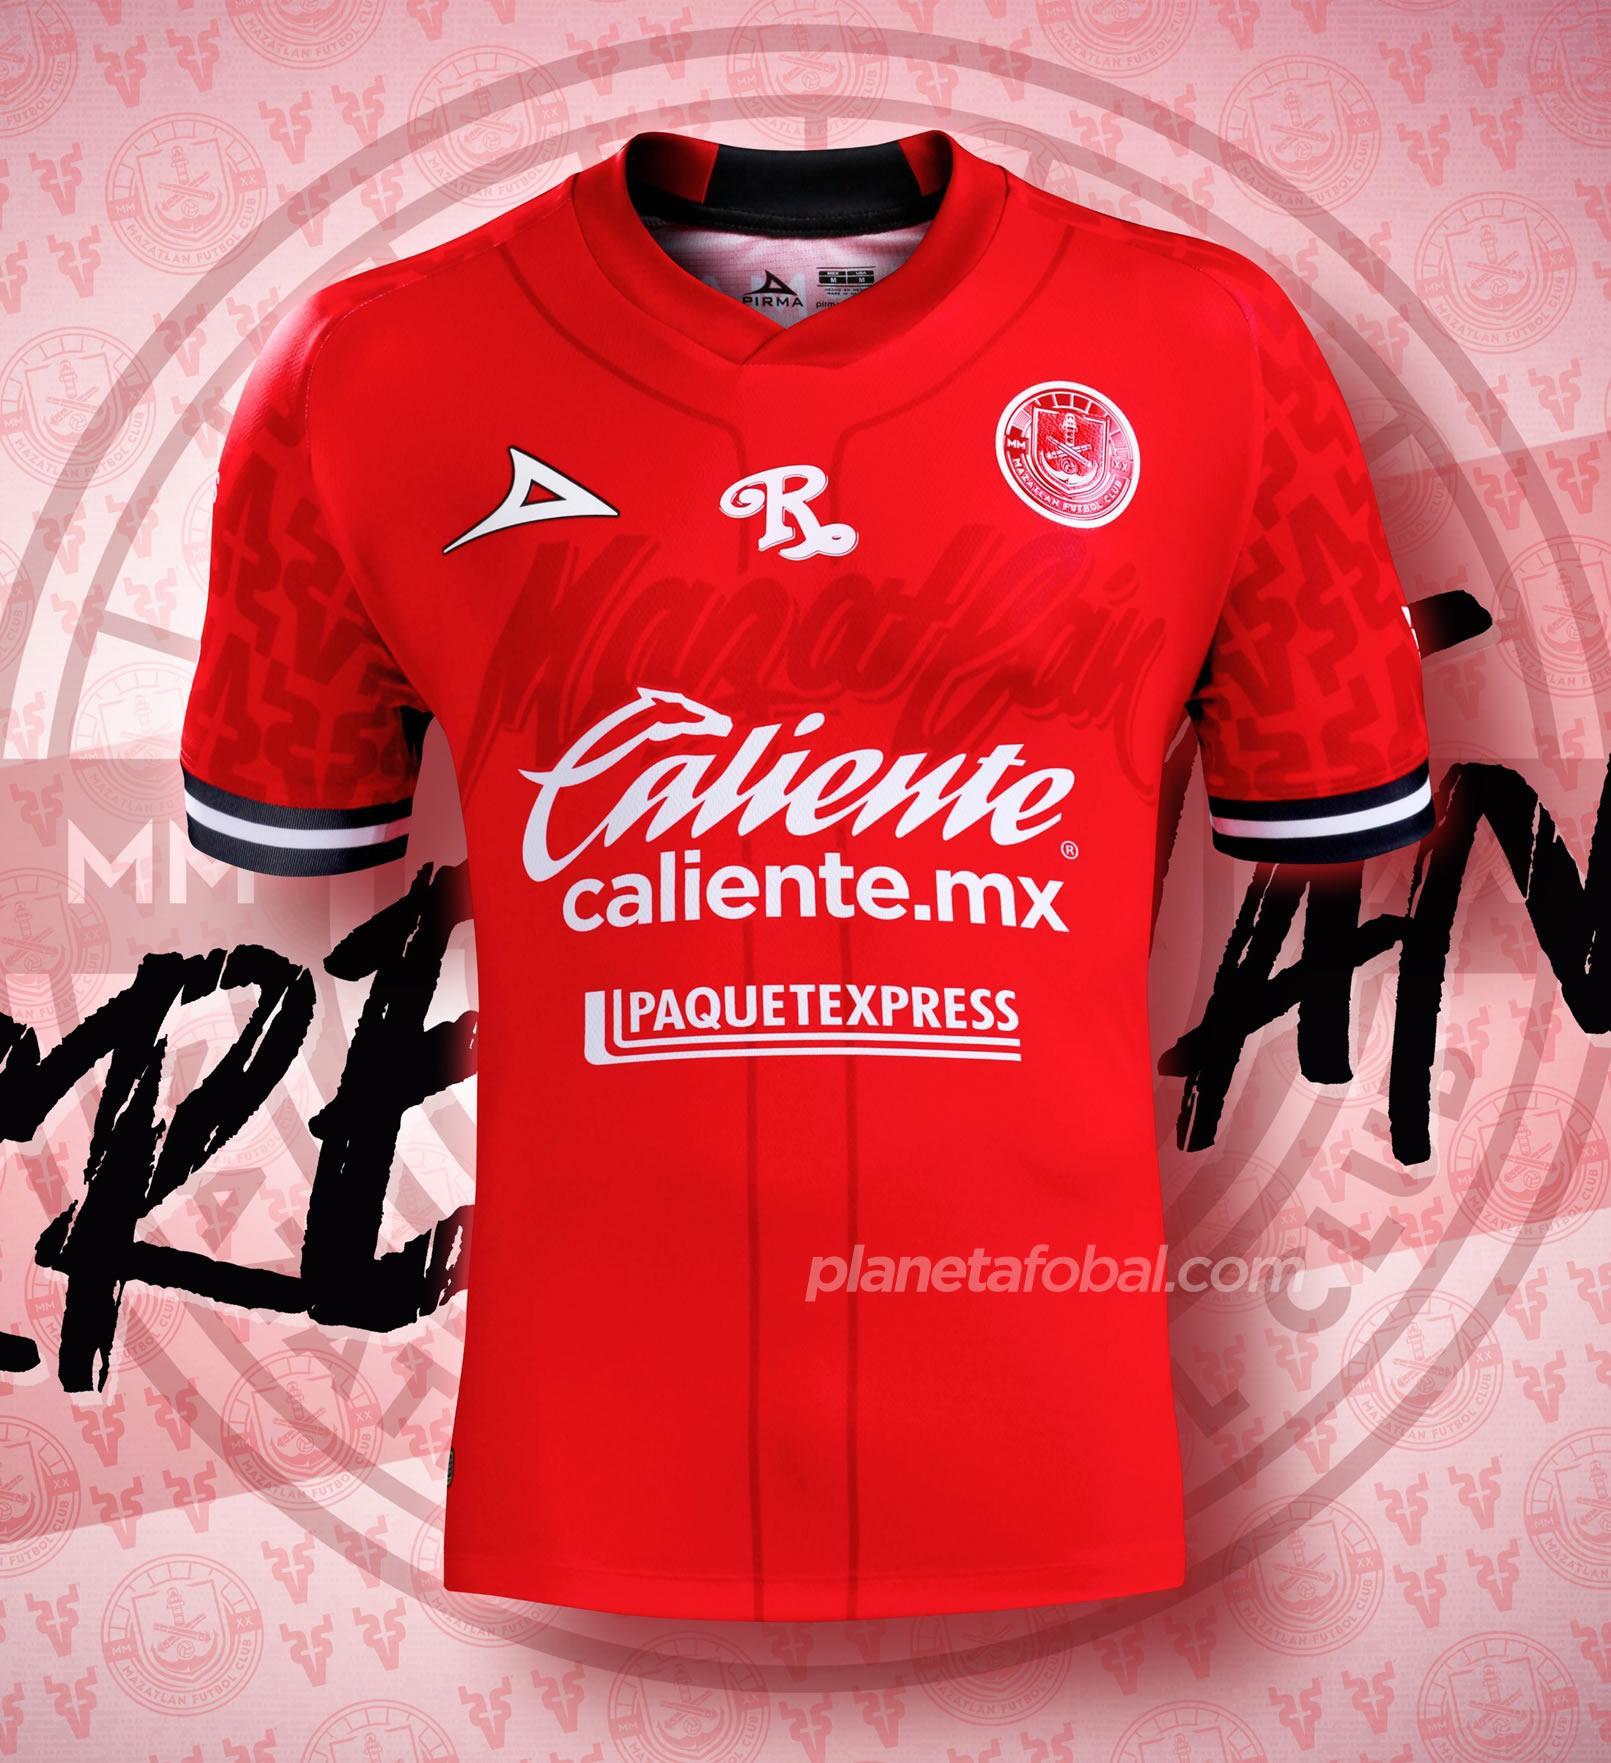 Tercera camiseta del Mazatlán FC 2020/21 | Imagen Pirma